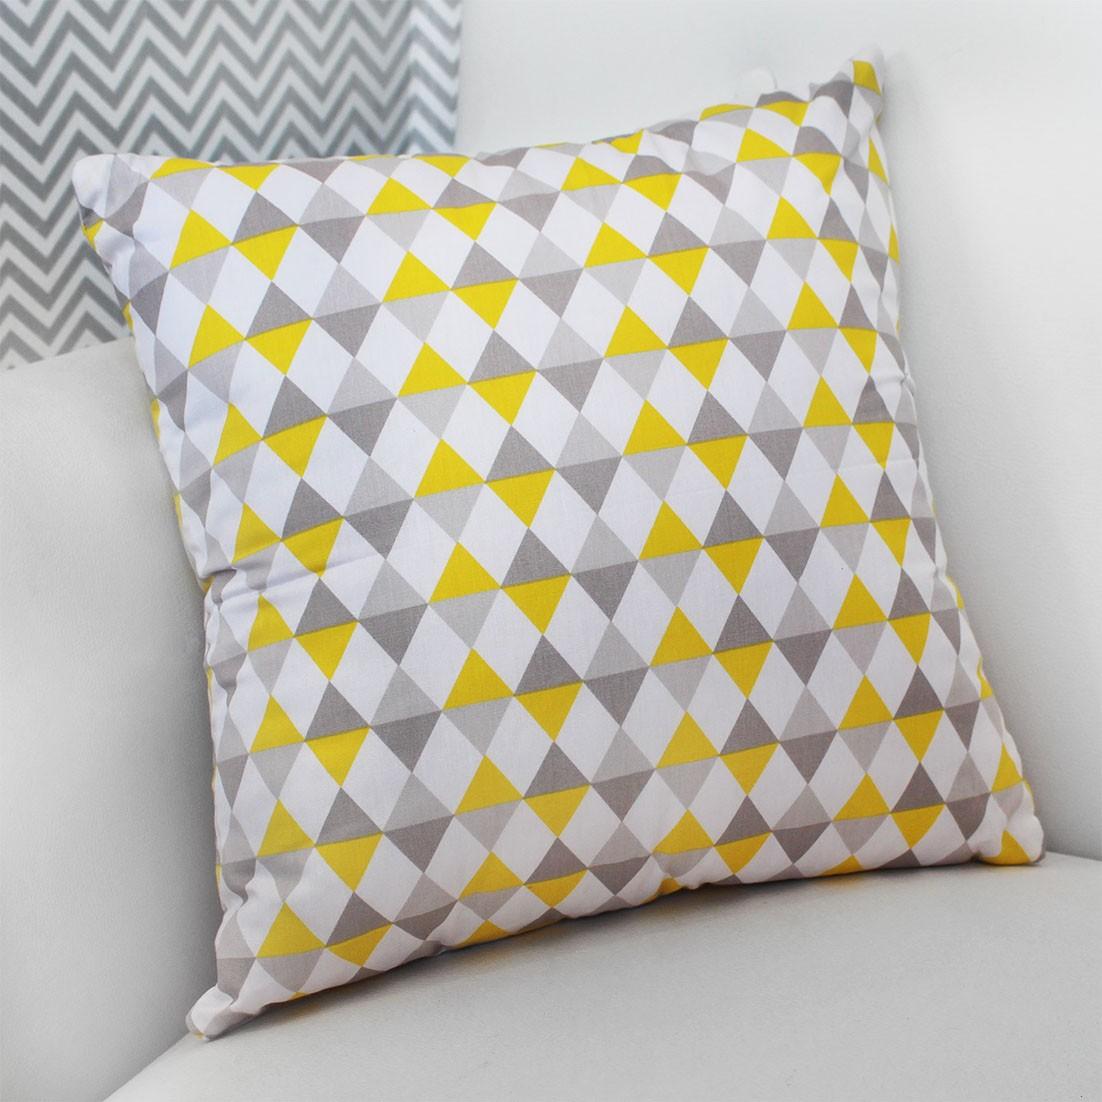 Almofada Decorativa Estampada Losango Amarelo